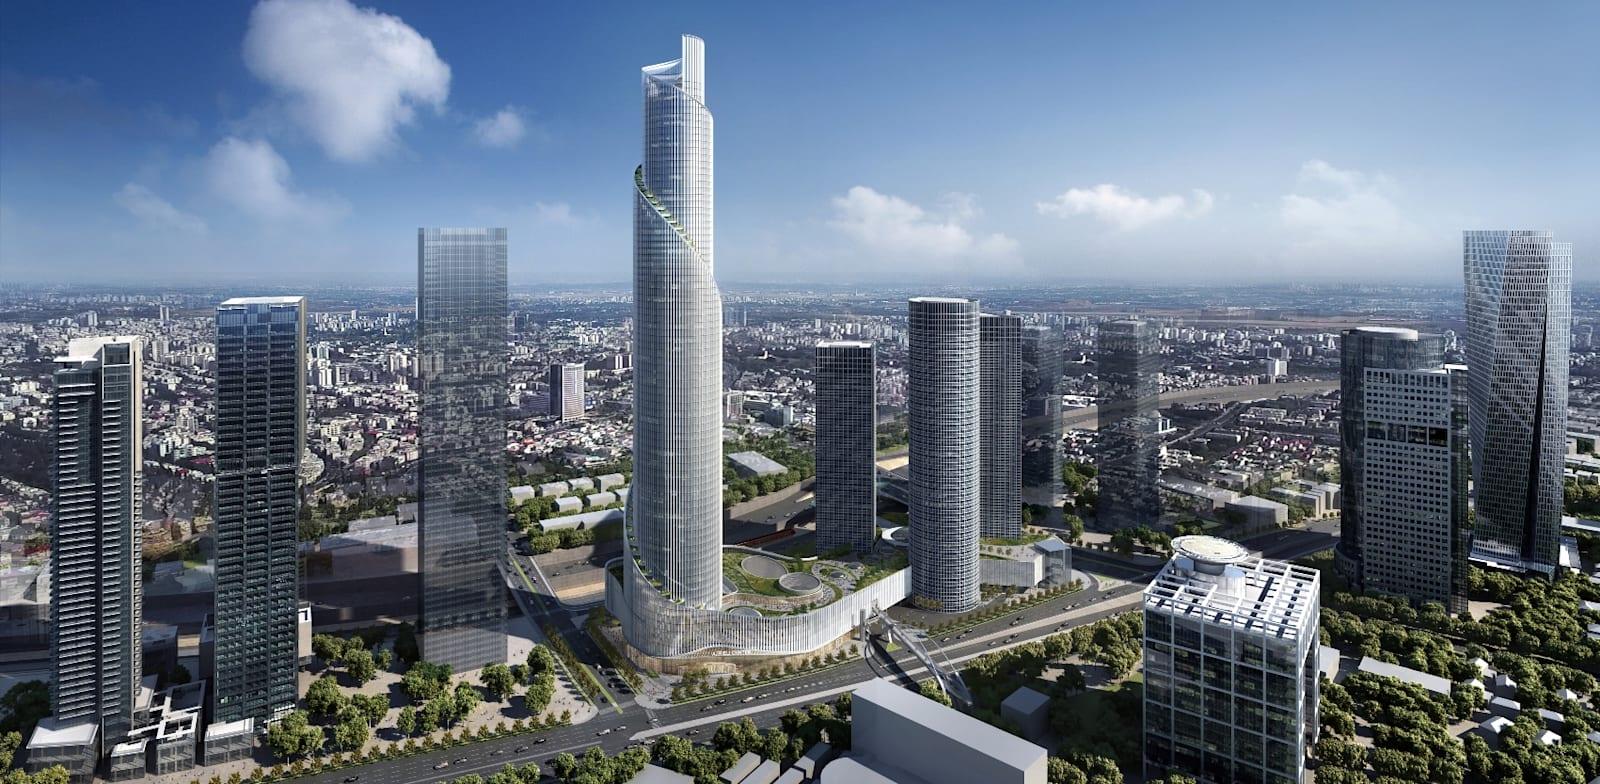 Azrieli Center Spiral Tower Credit: KPF